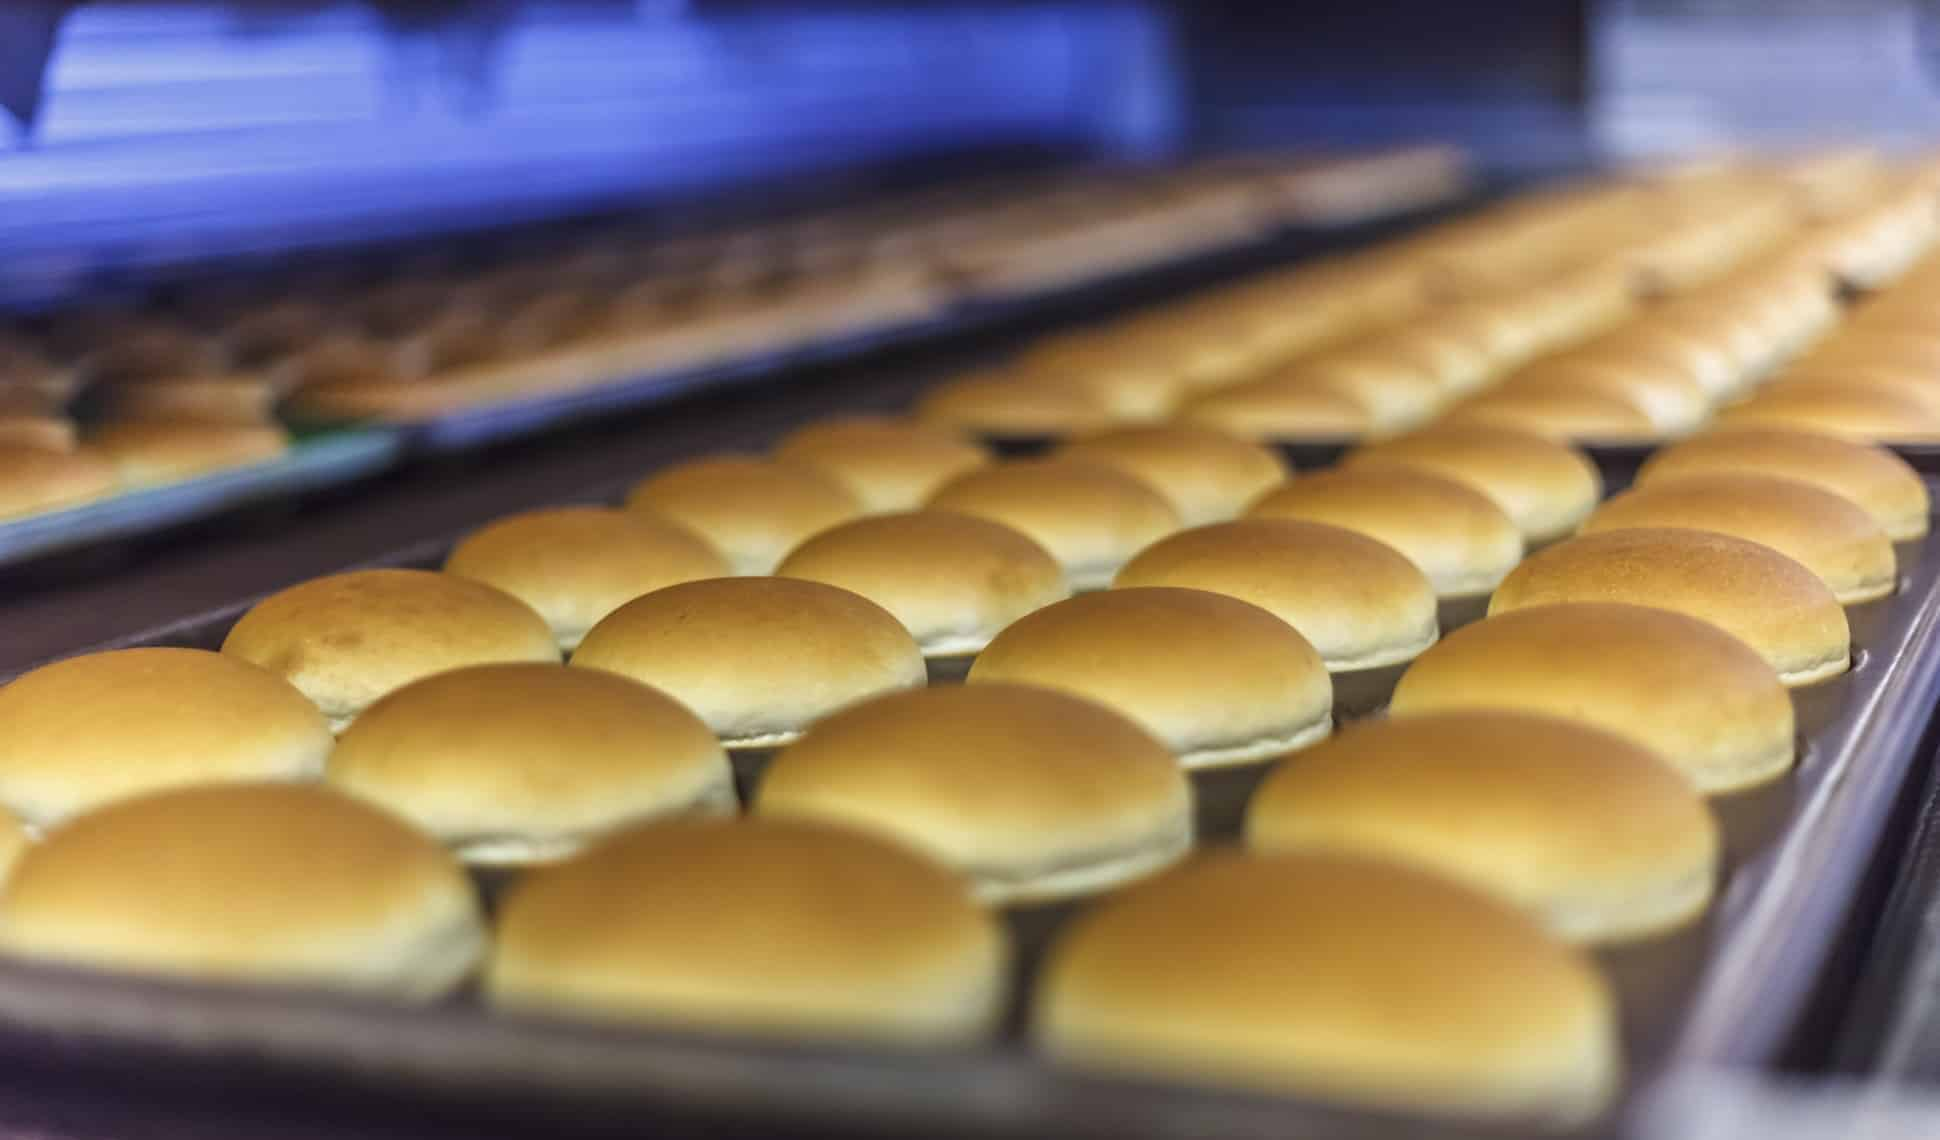 Bakery Industrial Bakery Equipment